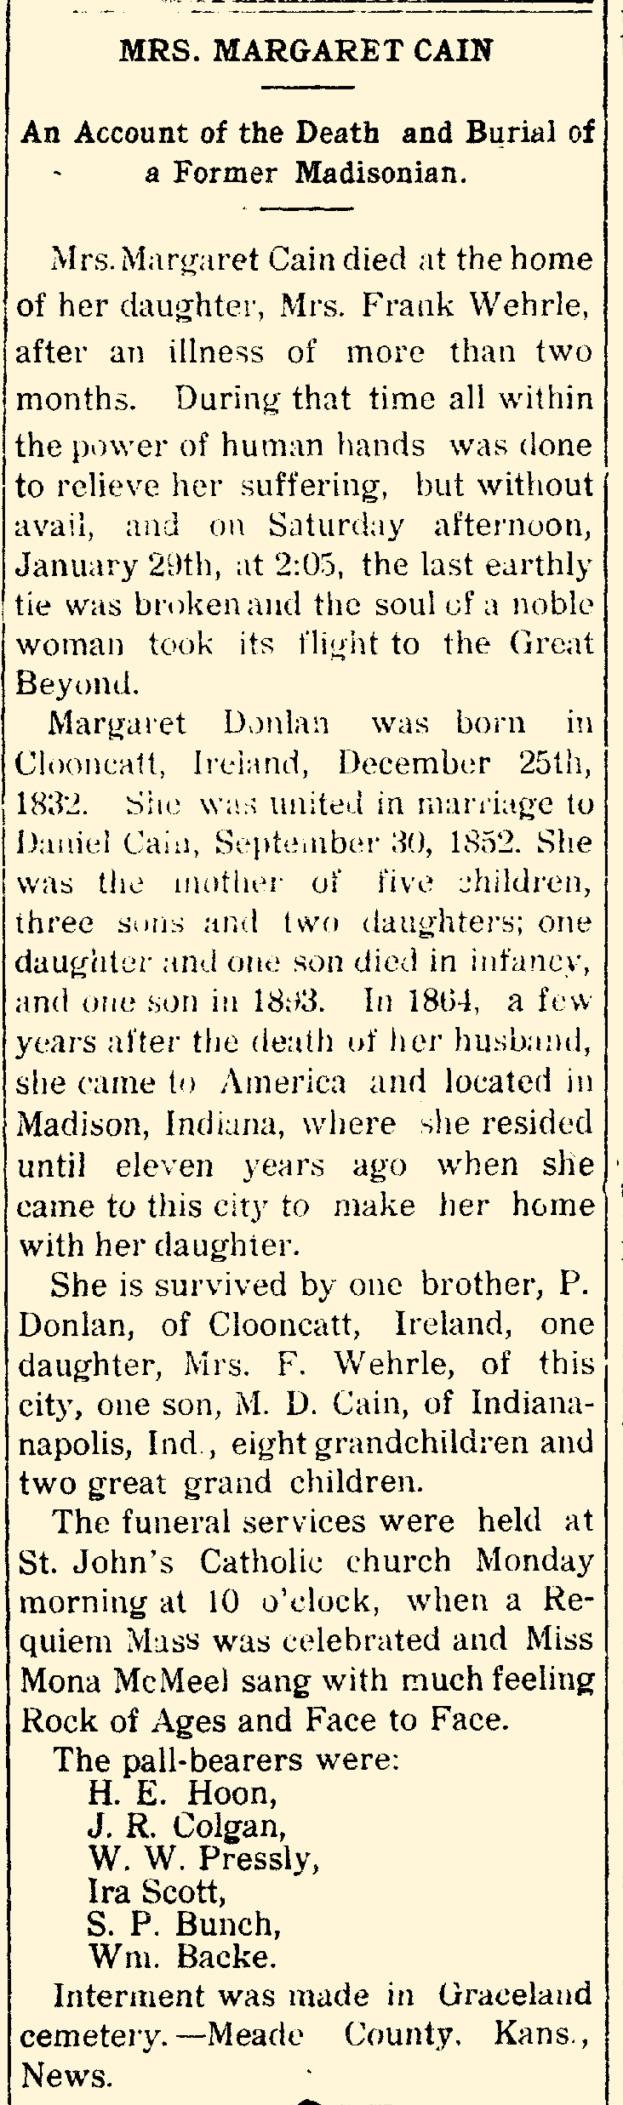 Cain Donlan Margaret